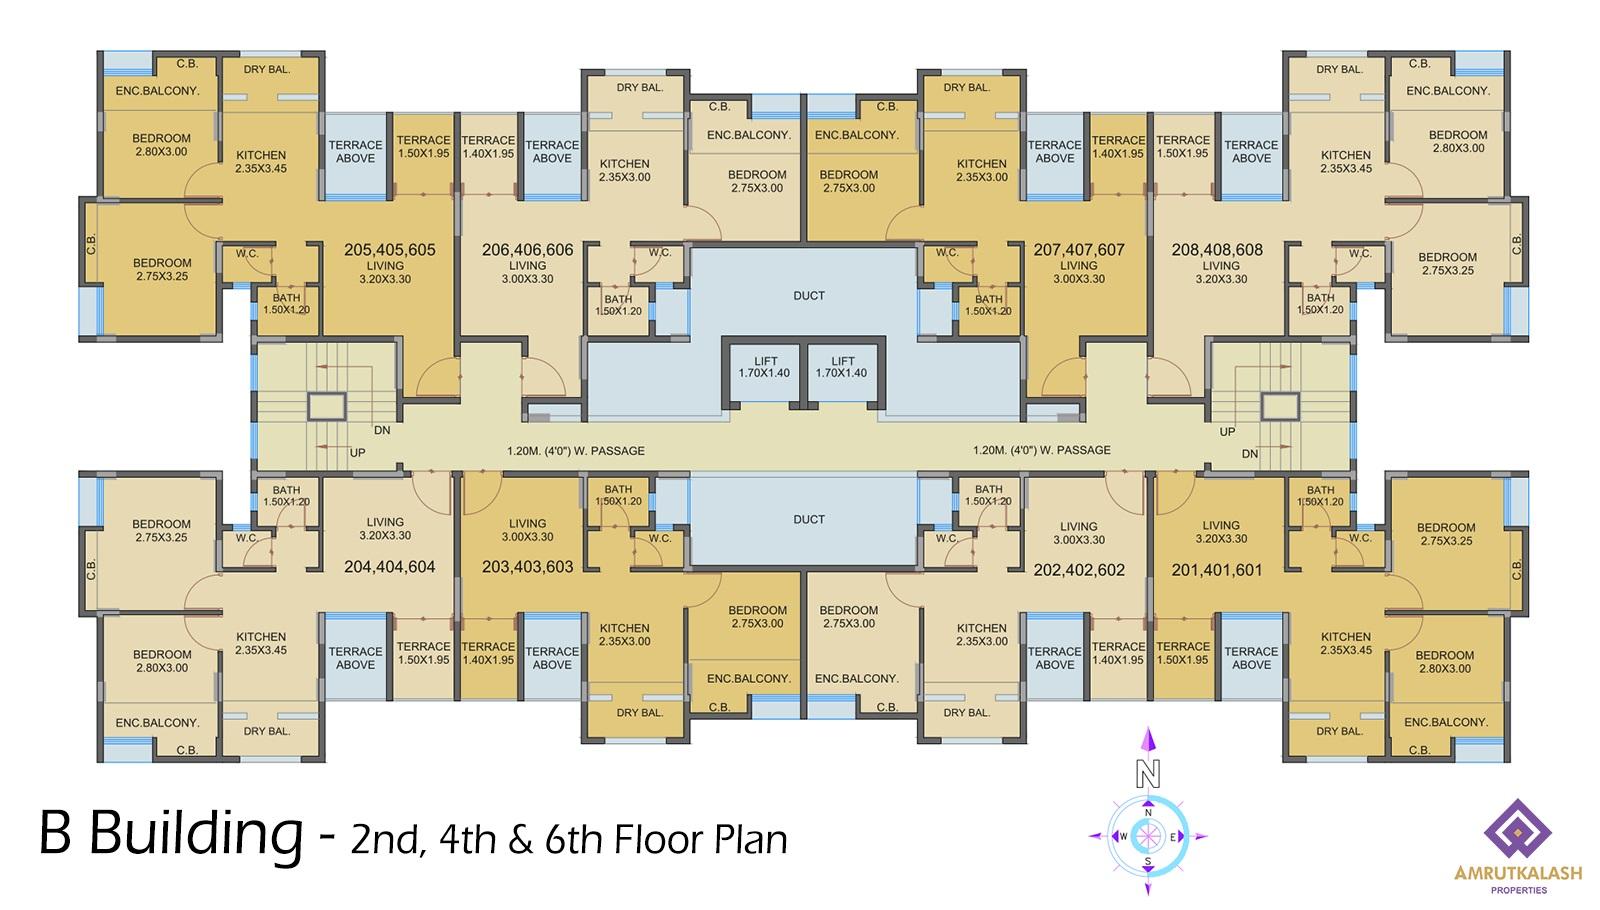 Floor Plans Amrut Kalash Properties Diagram 3 Sixth Layout B Building 2nd 4th 6th Plan